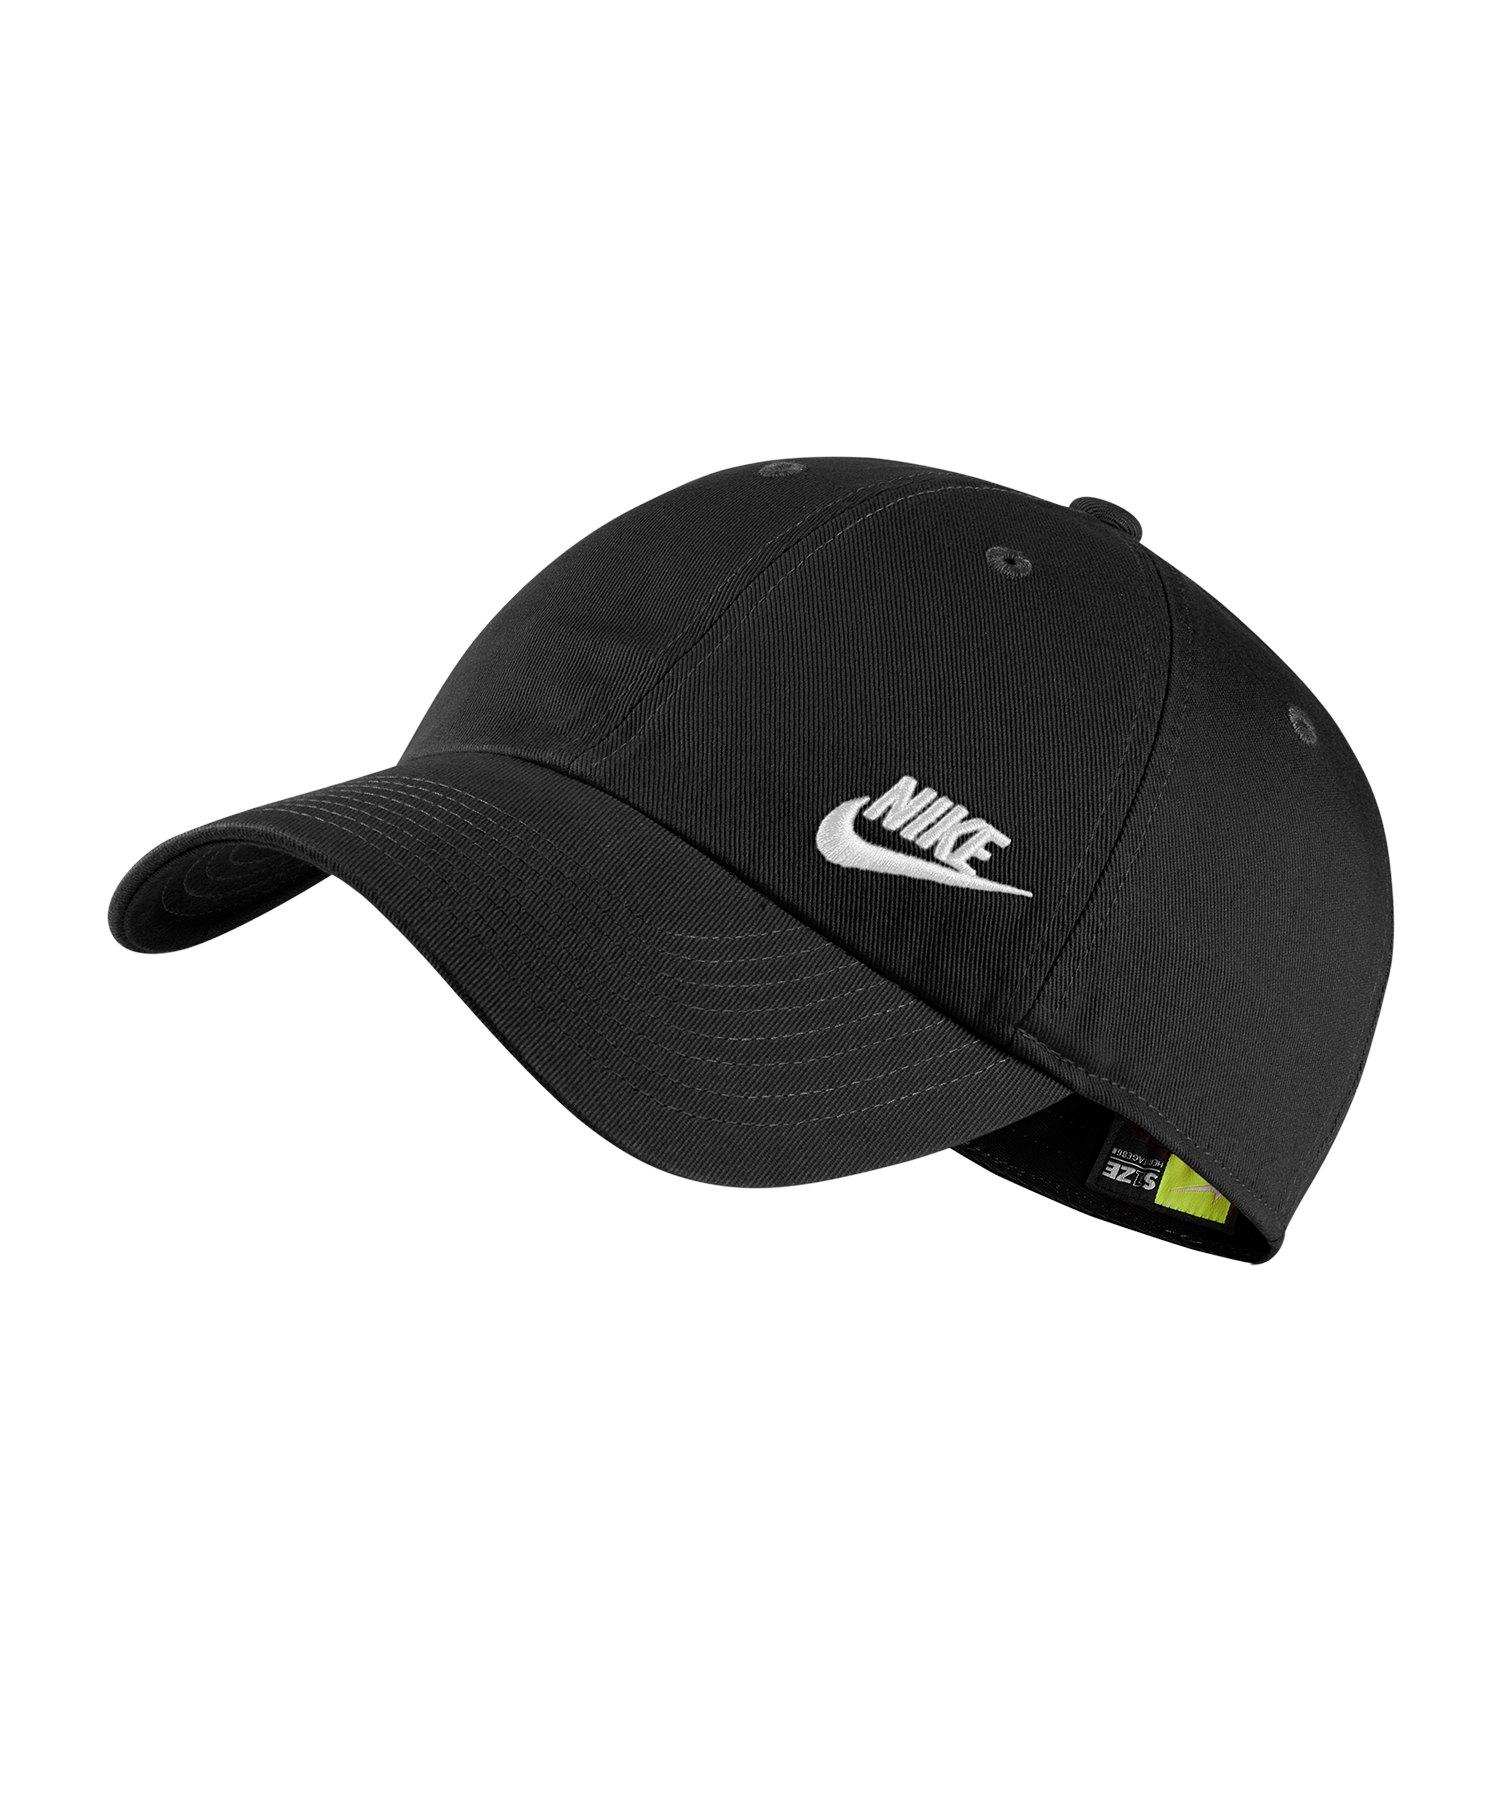 Nike Heritage 86 Classic Kappe Damen Schwarz F010 - Schwarz